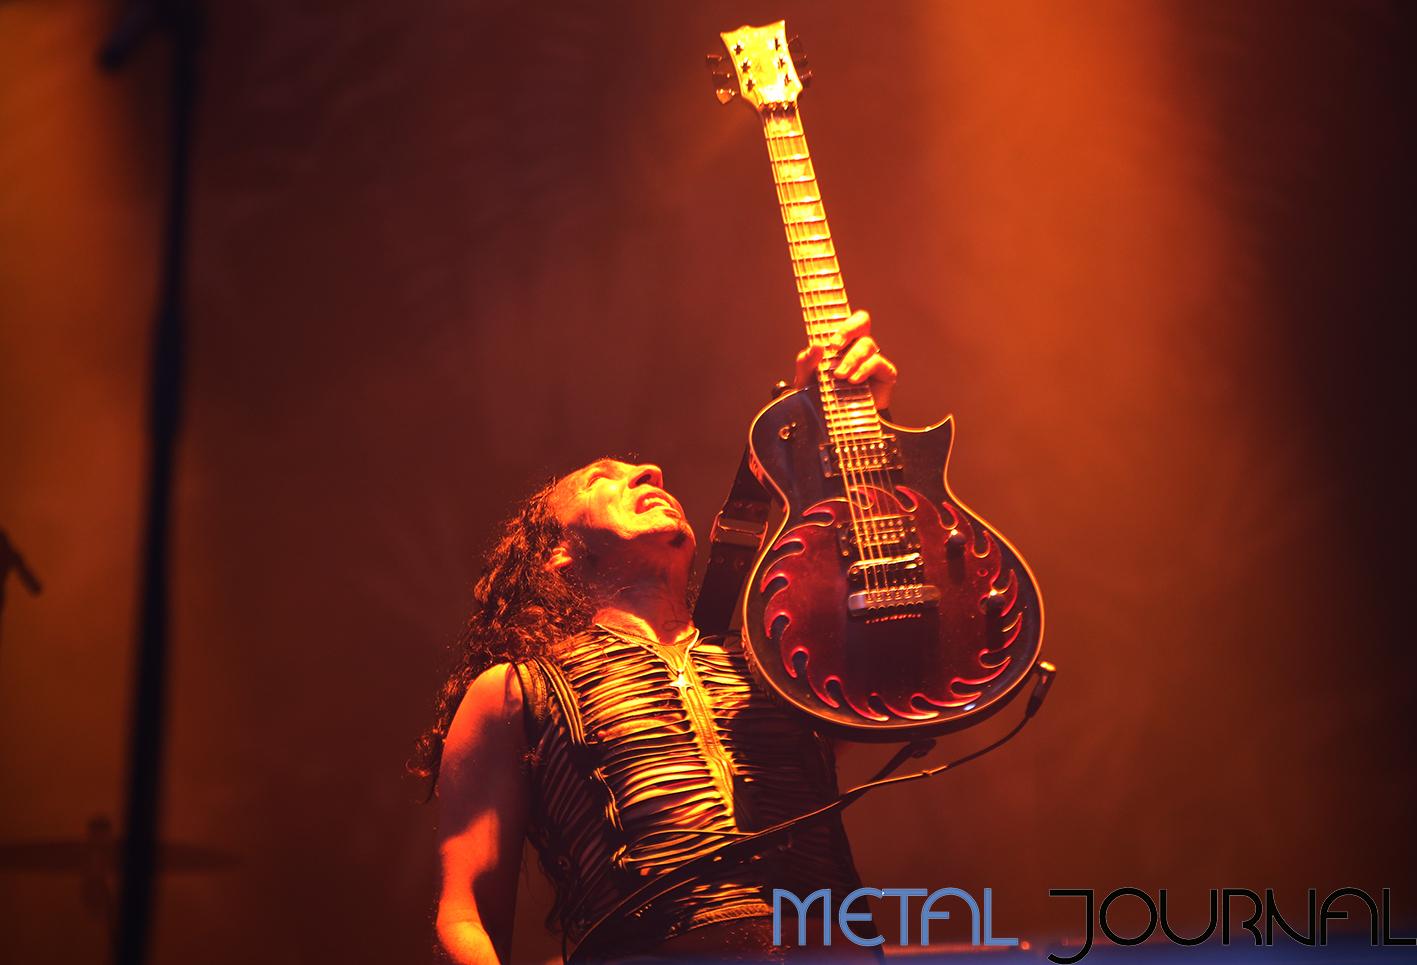 wasp - metal journal rock fest barcelona 2019 pic 4